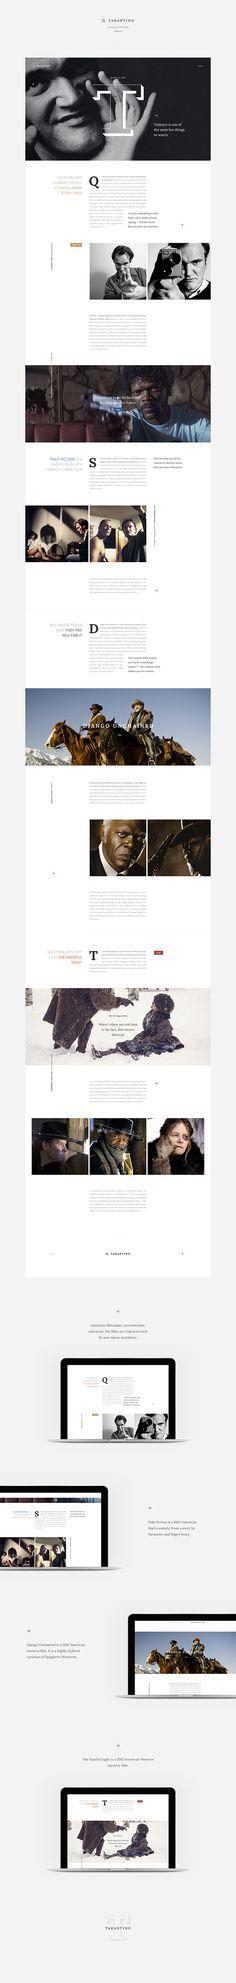 Tarantino personal website concept - Web Design - Editorial Design translated to Web, Big images, Clean, Typographic Minimal Web Design, Design Web, Web Design Mobile, Blog Design, Design Ideas, Website Design Inspiration, Website Design Layout, Web Layout, Layout Design